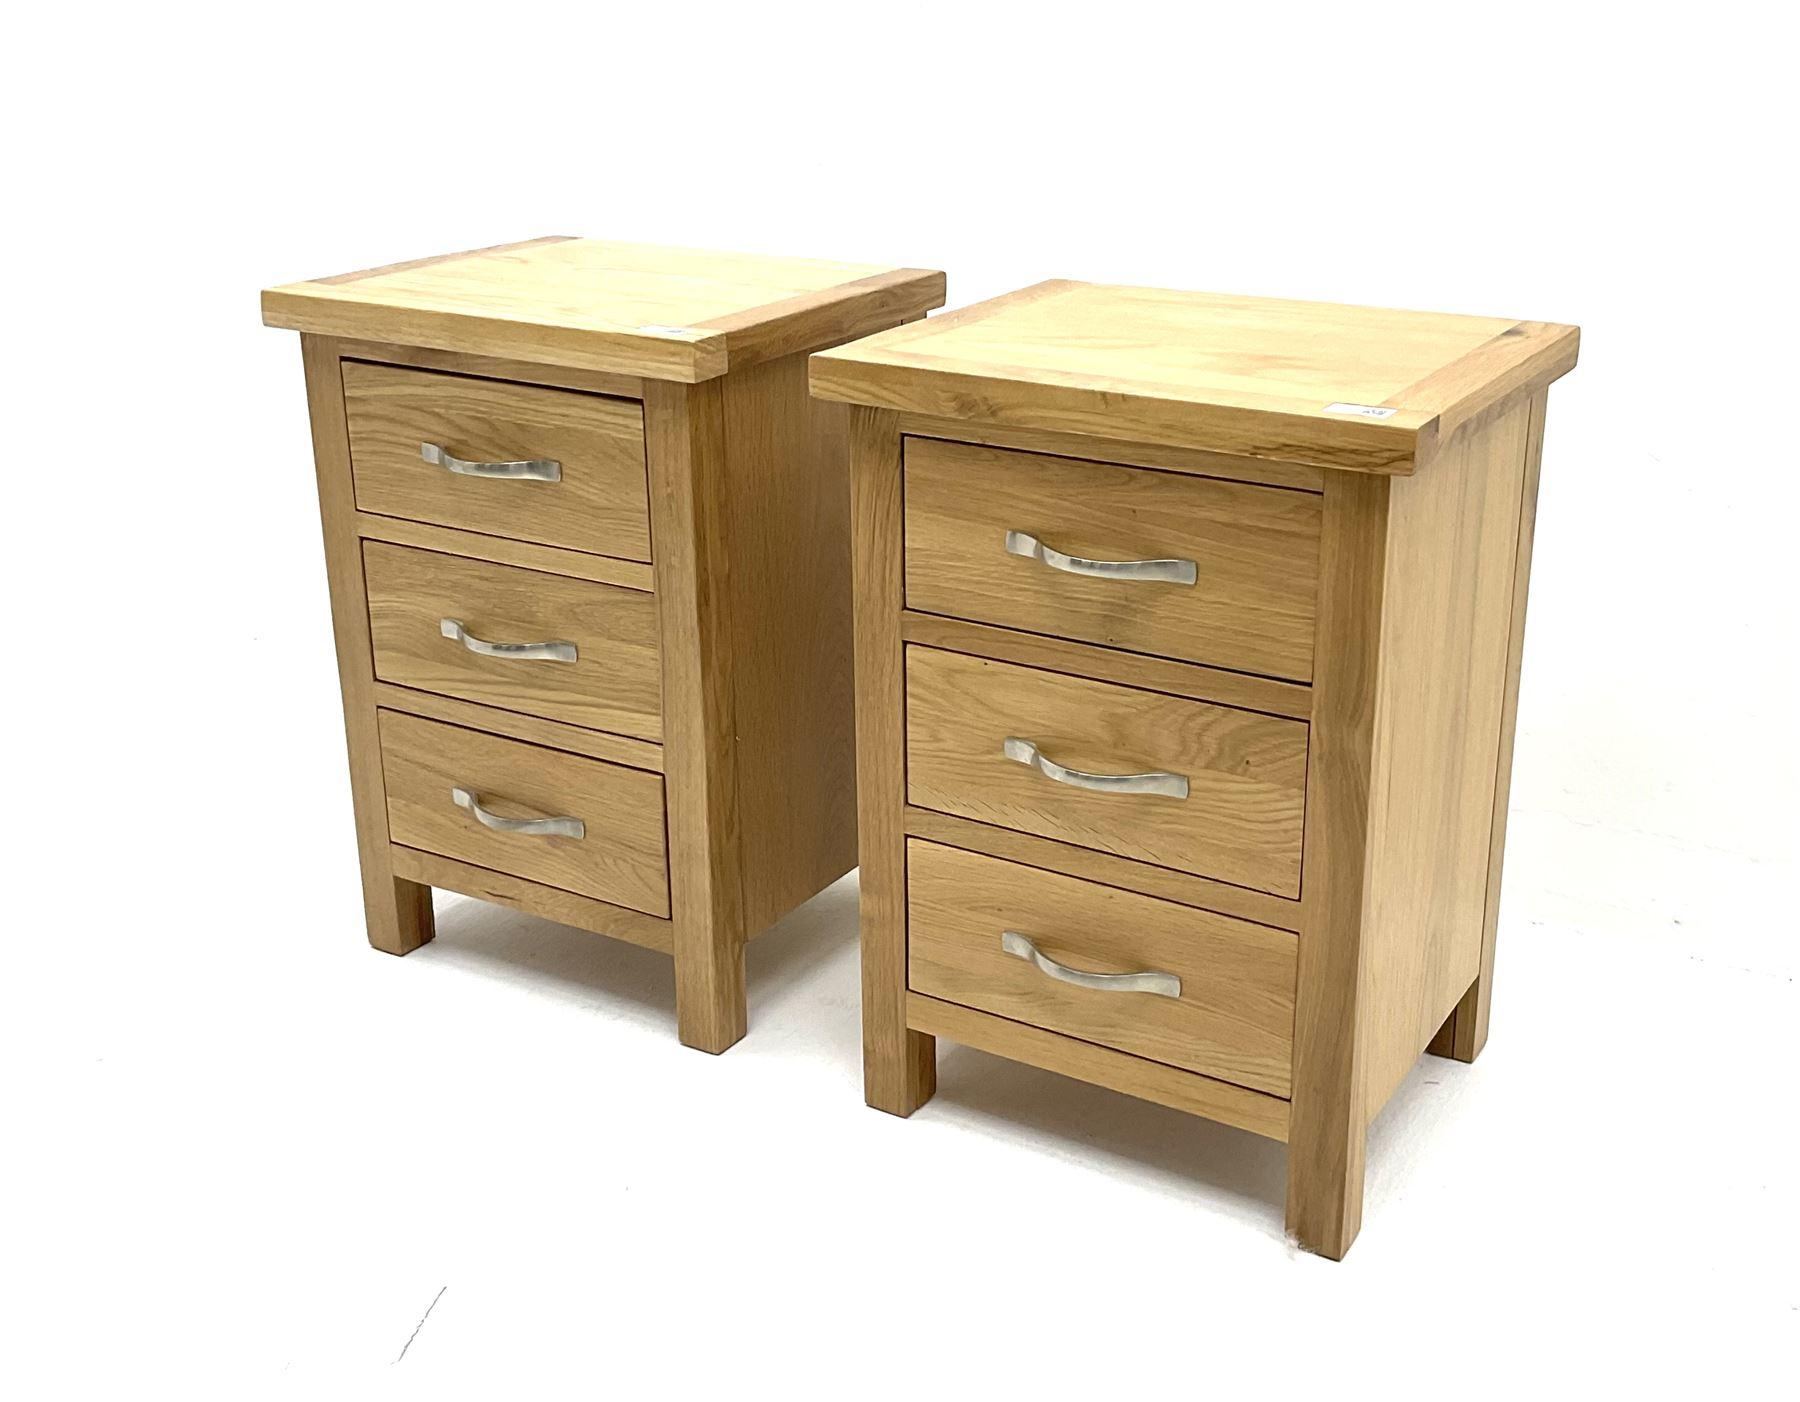 Pair light oak bedside pedestal chests